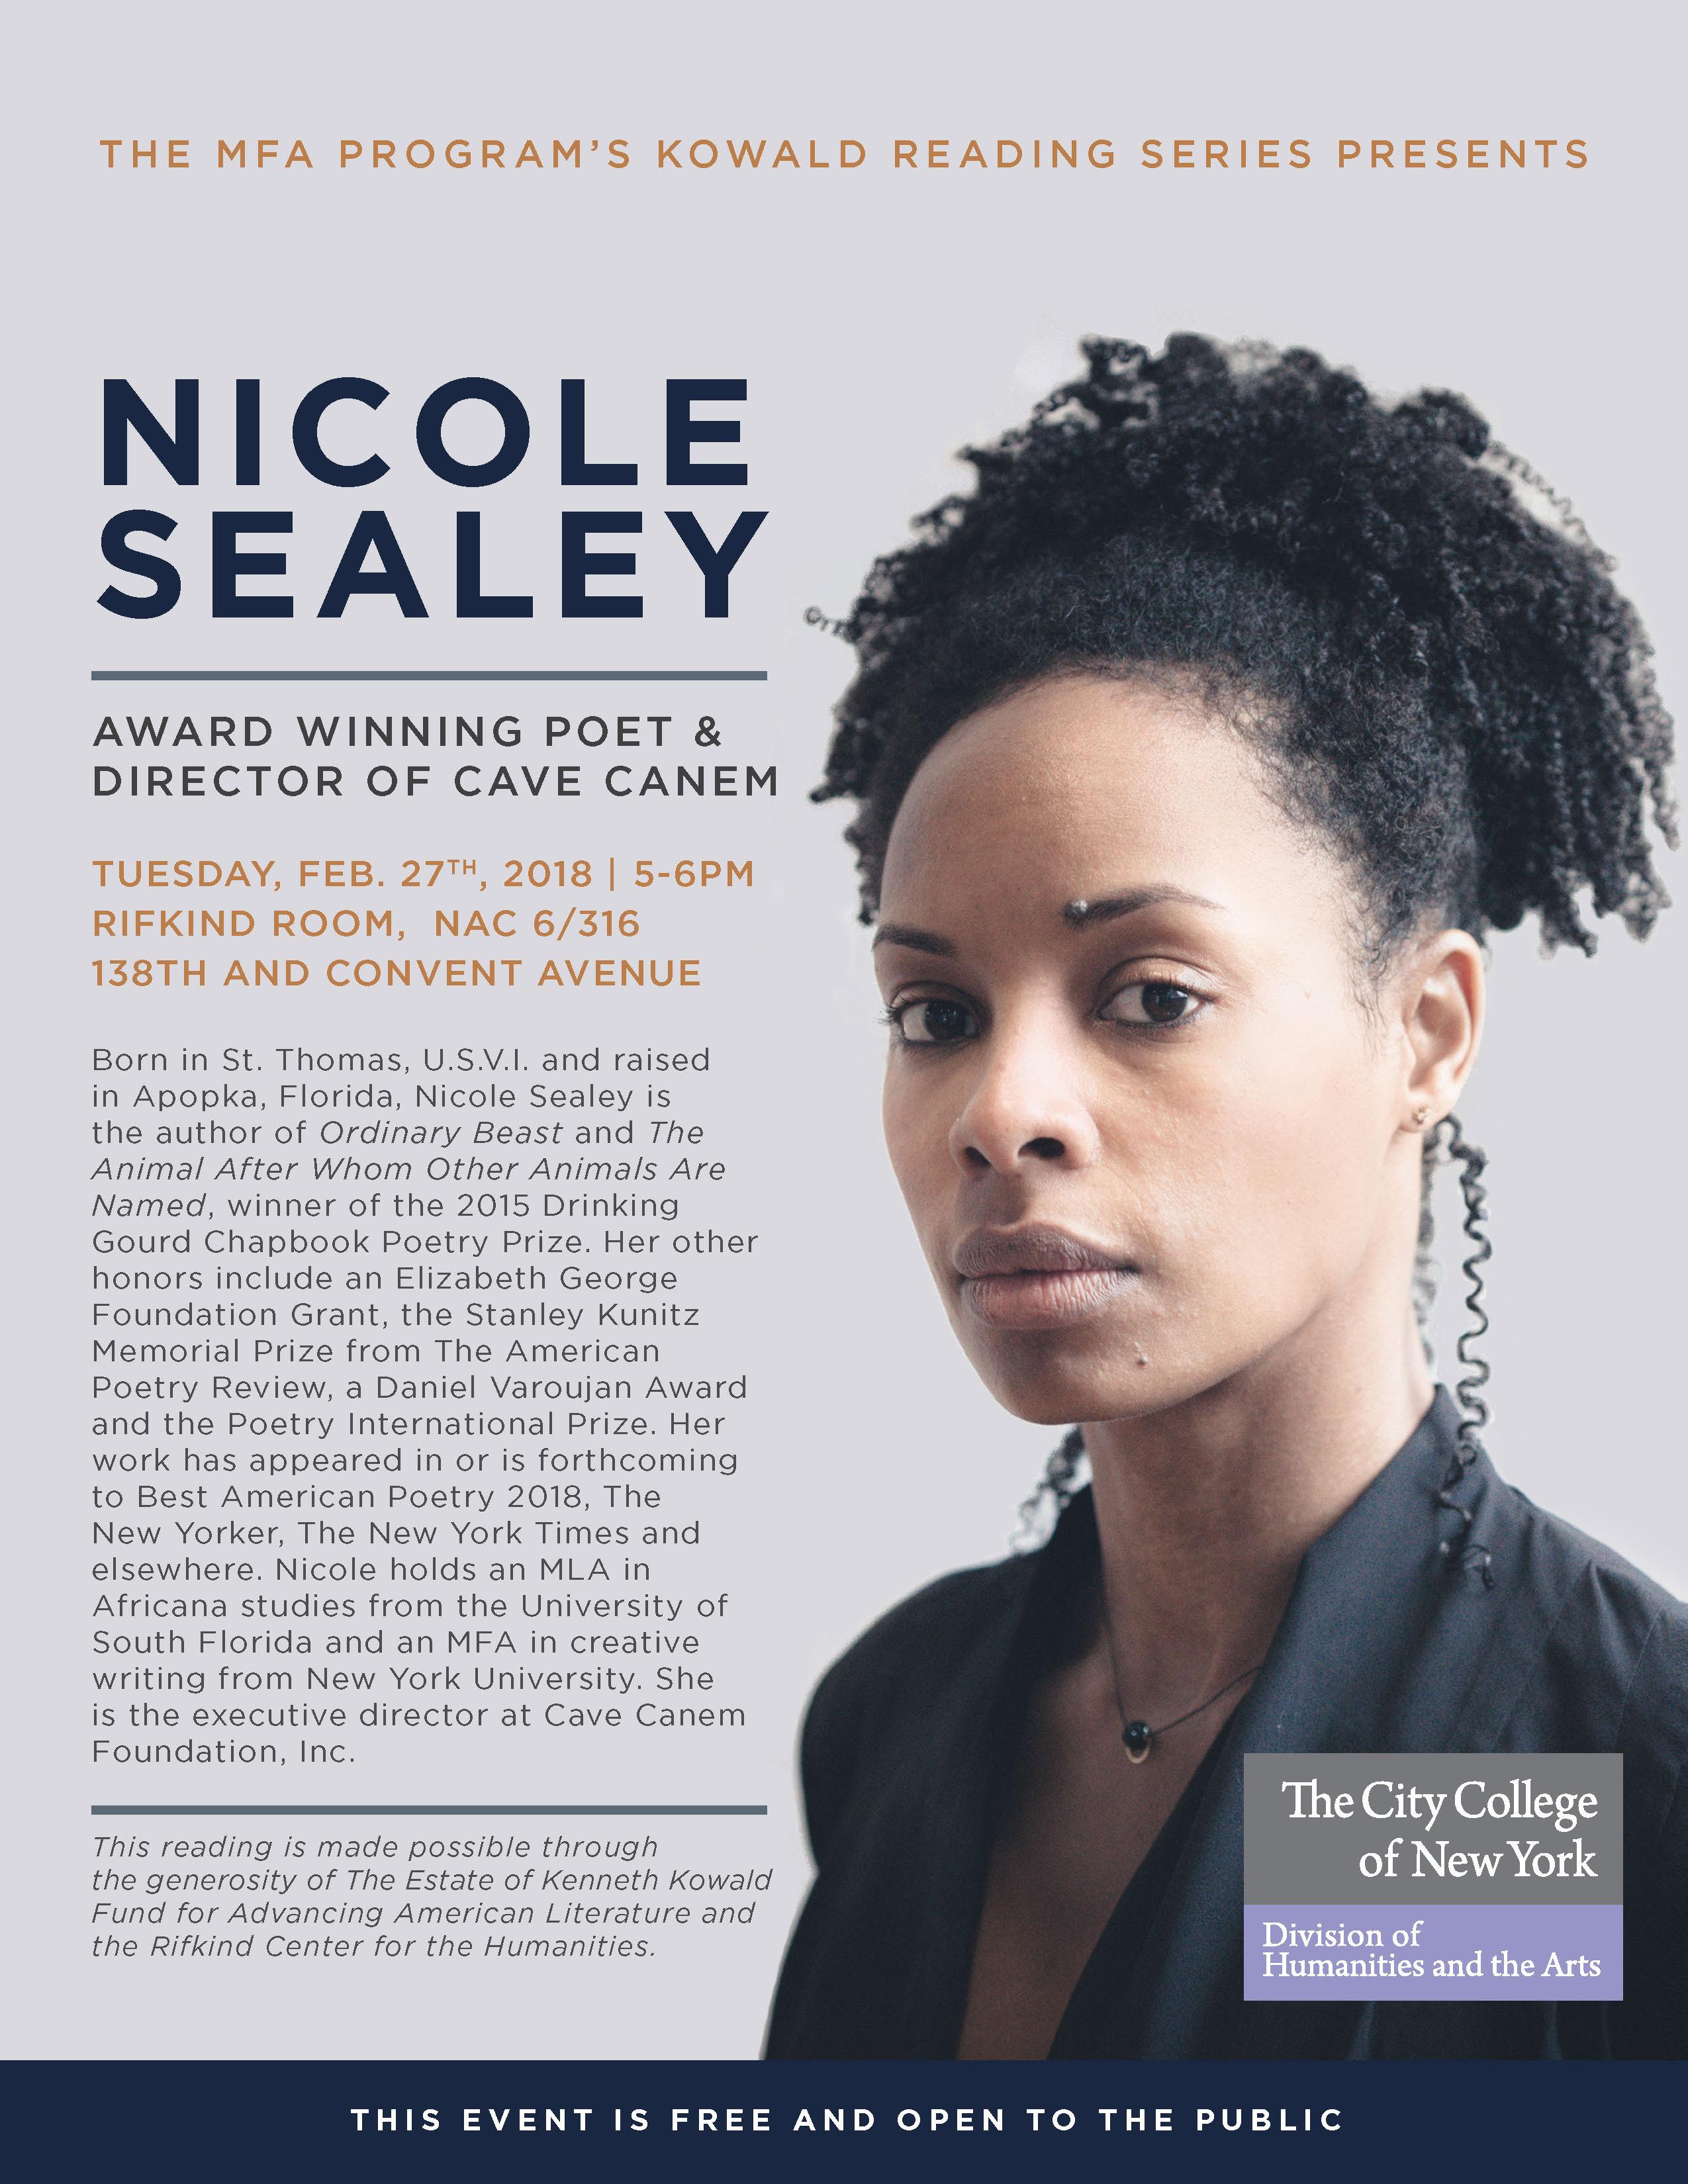 Nicole Sealey